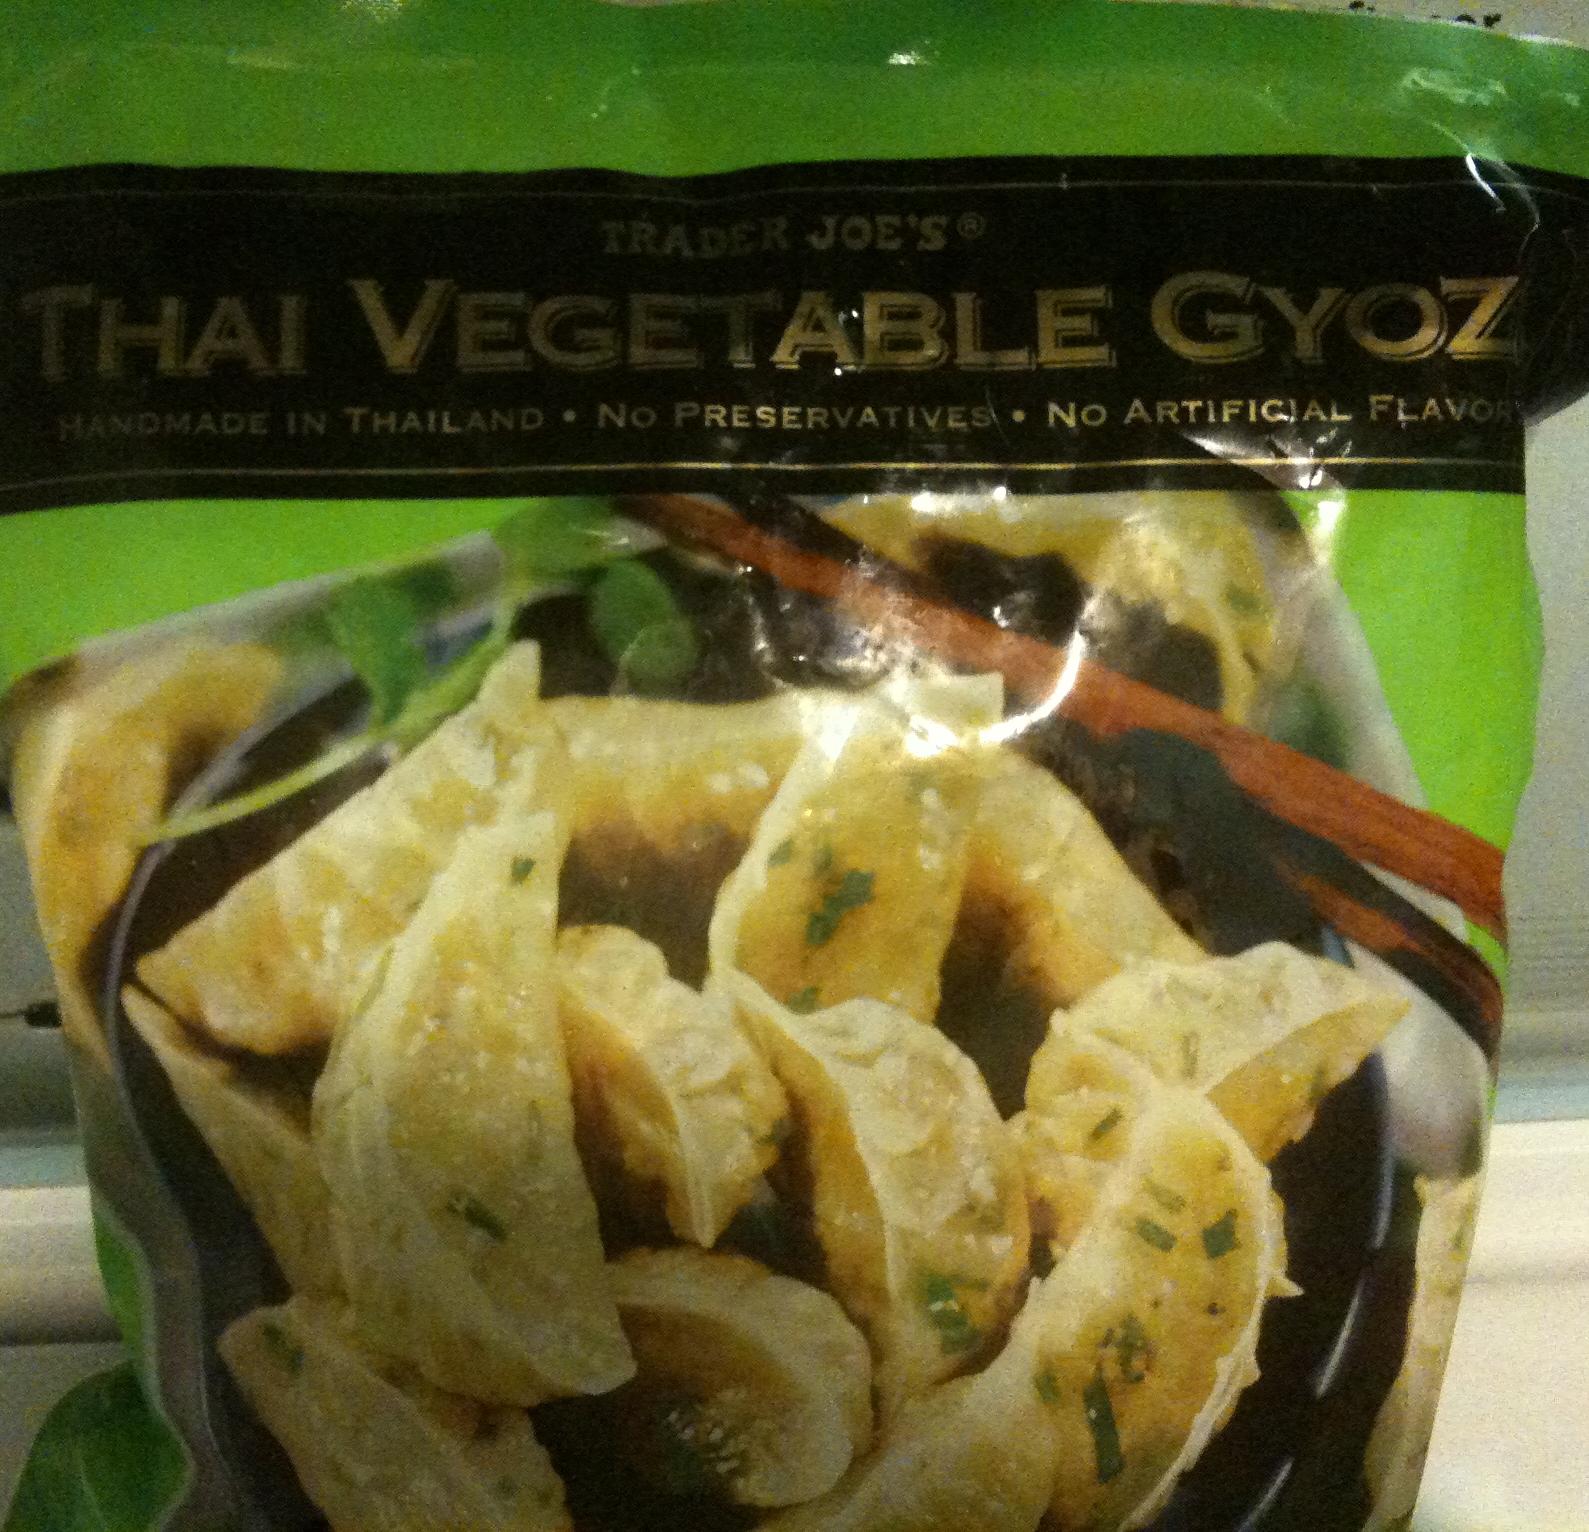 ... vegetarian gyoza potstickers vegetarian gyoza potstickers vegetarian